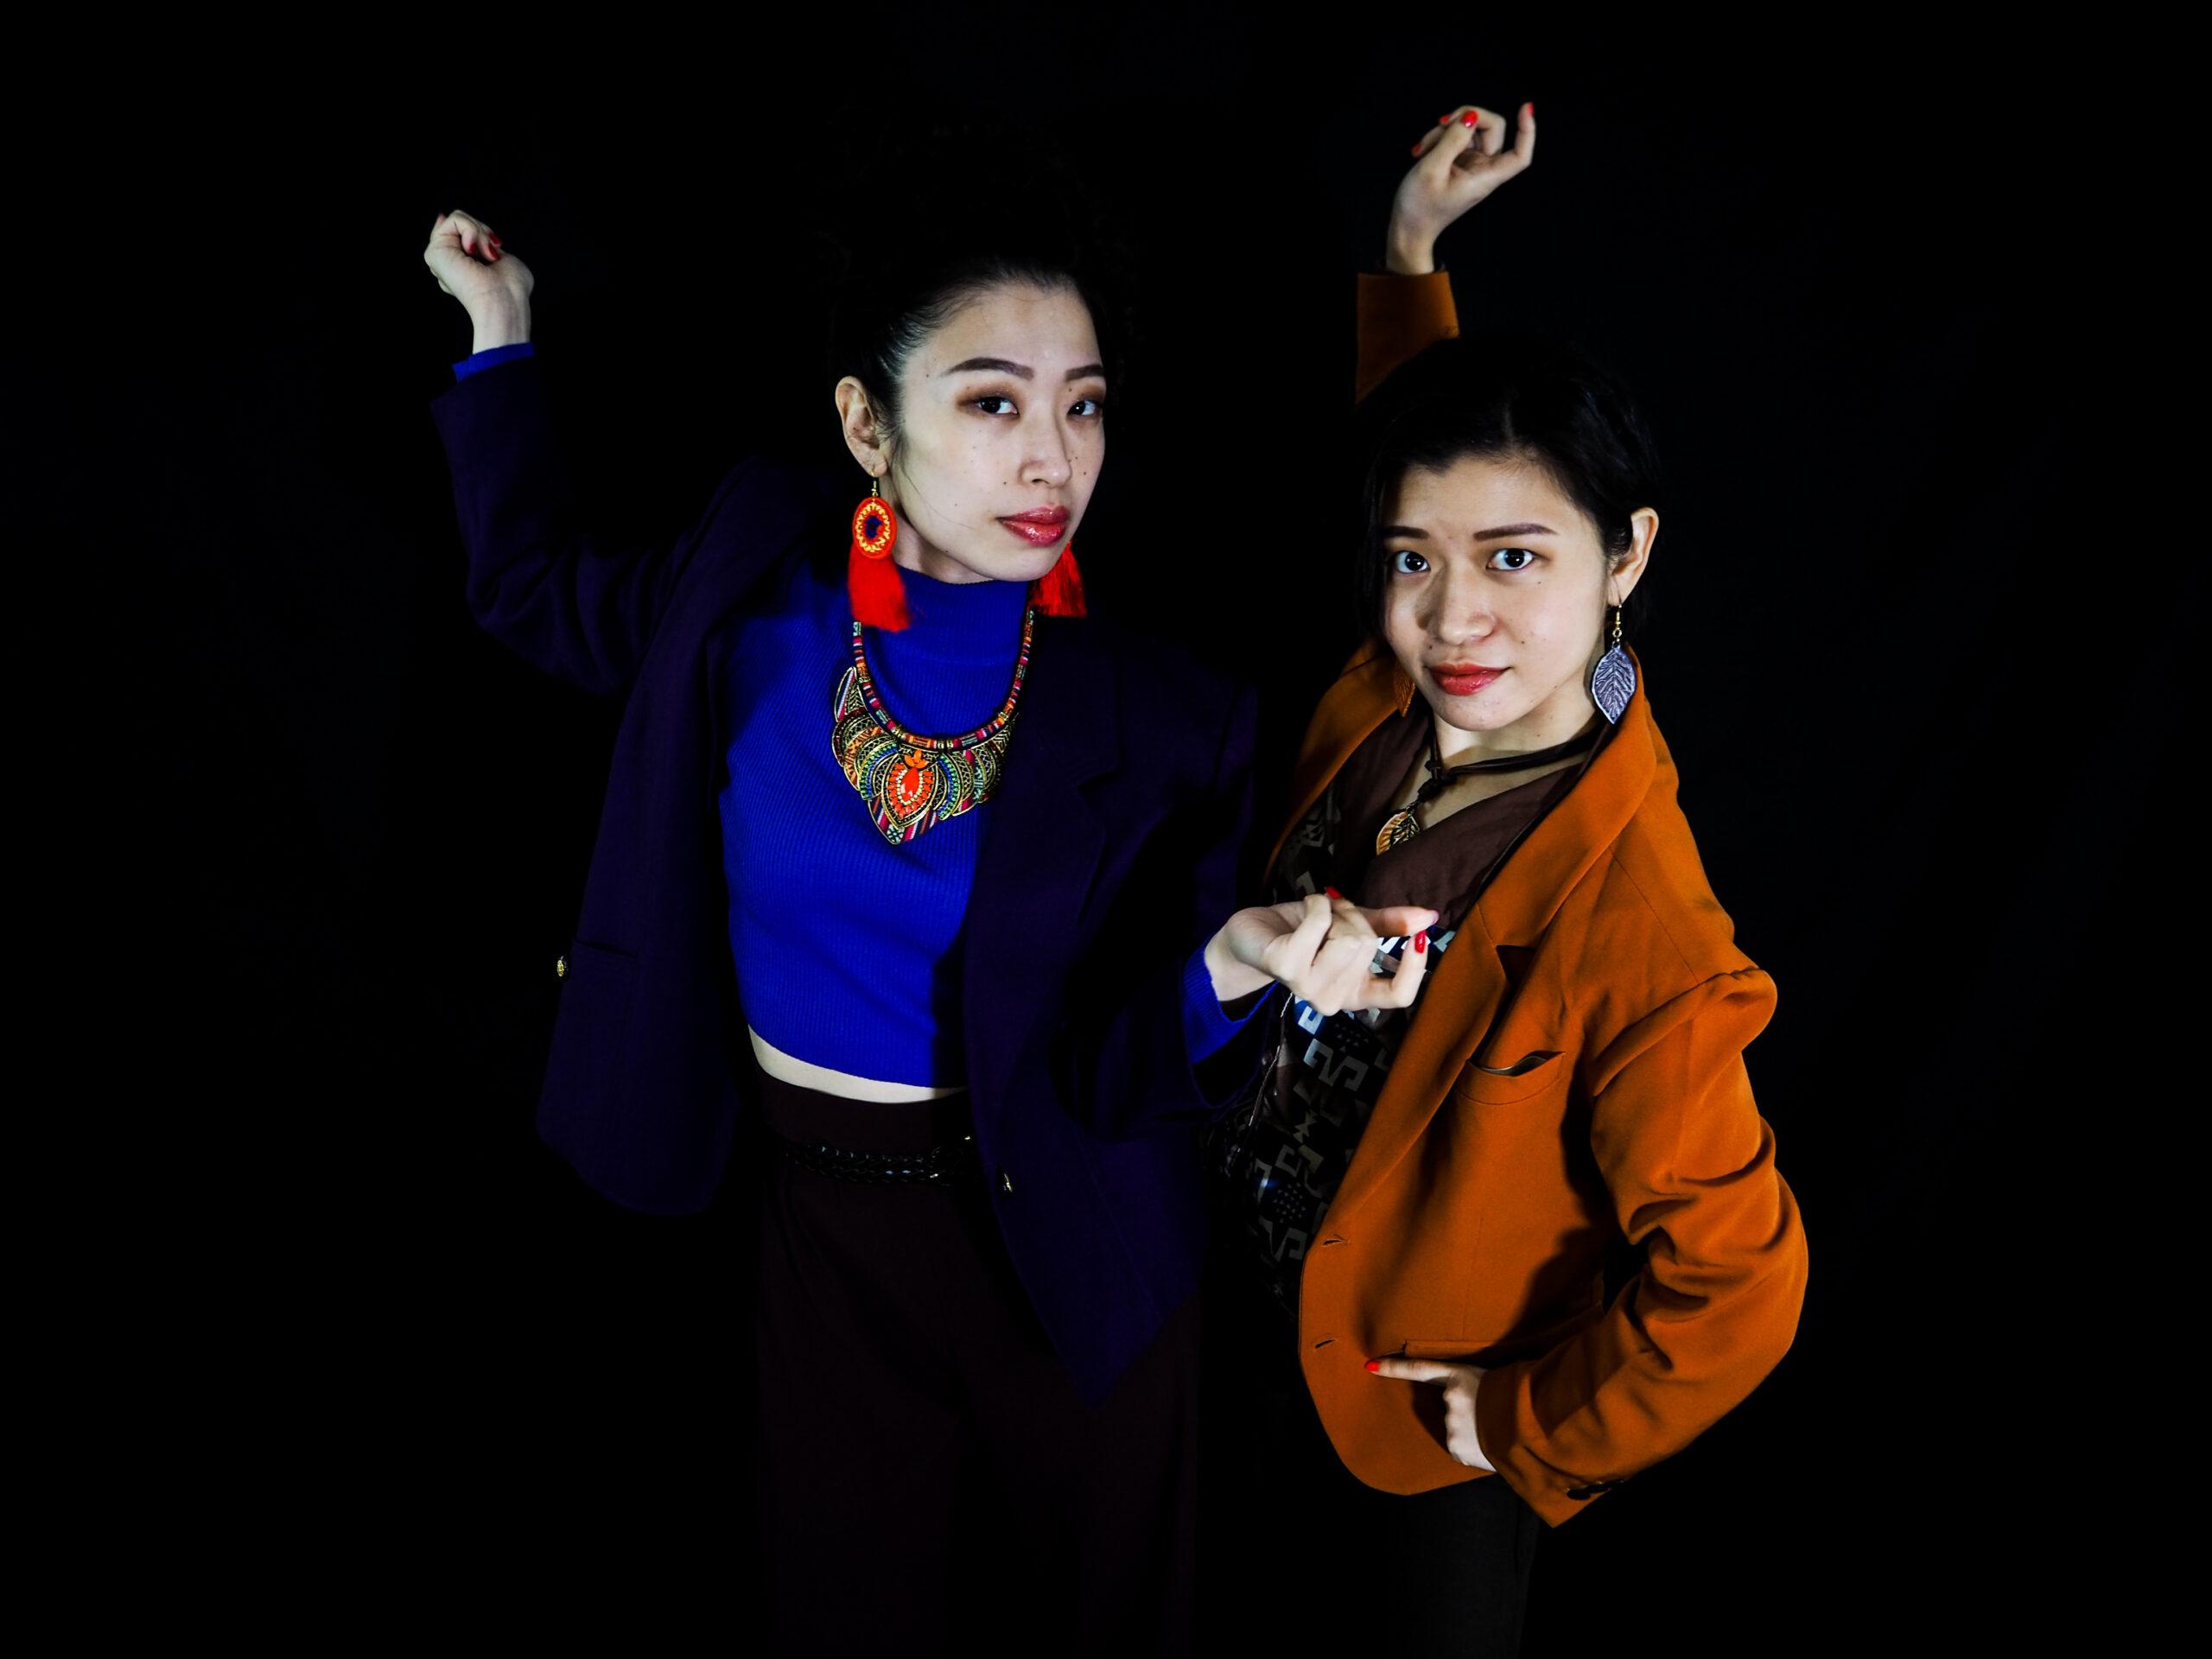 Artist photo (jacket style)